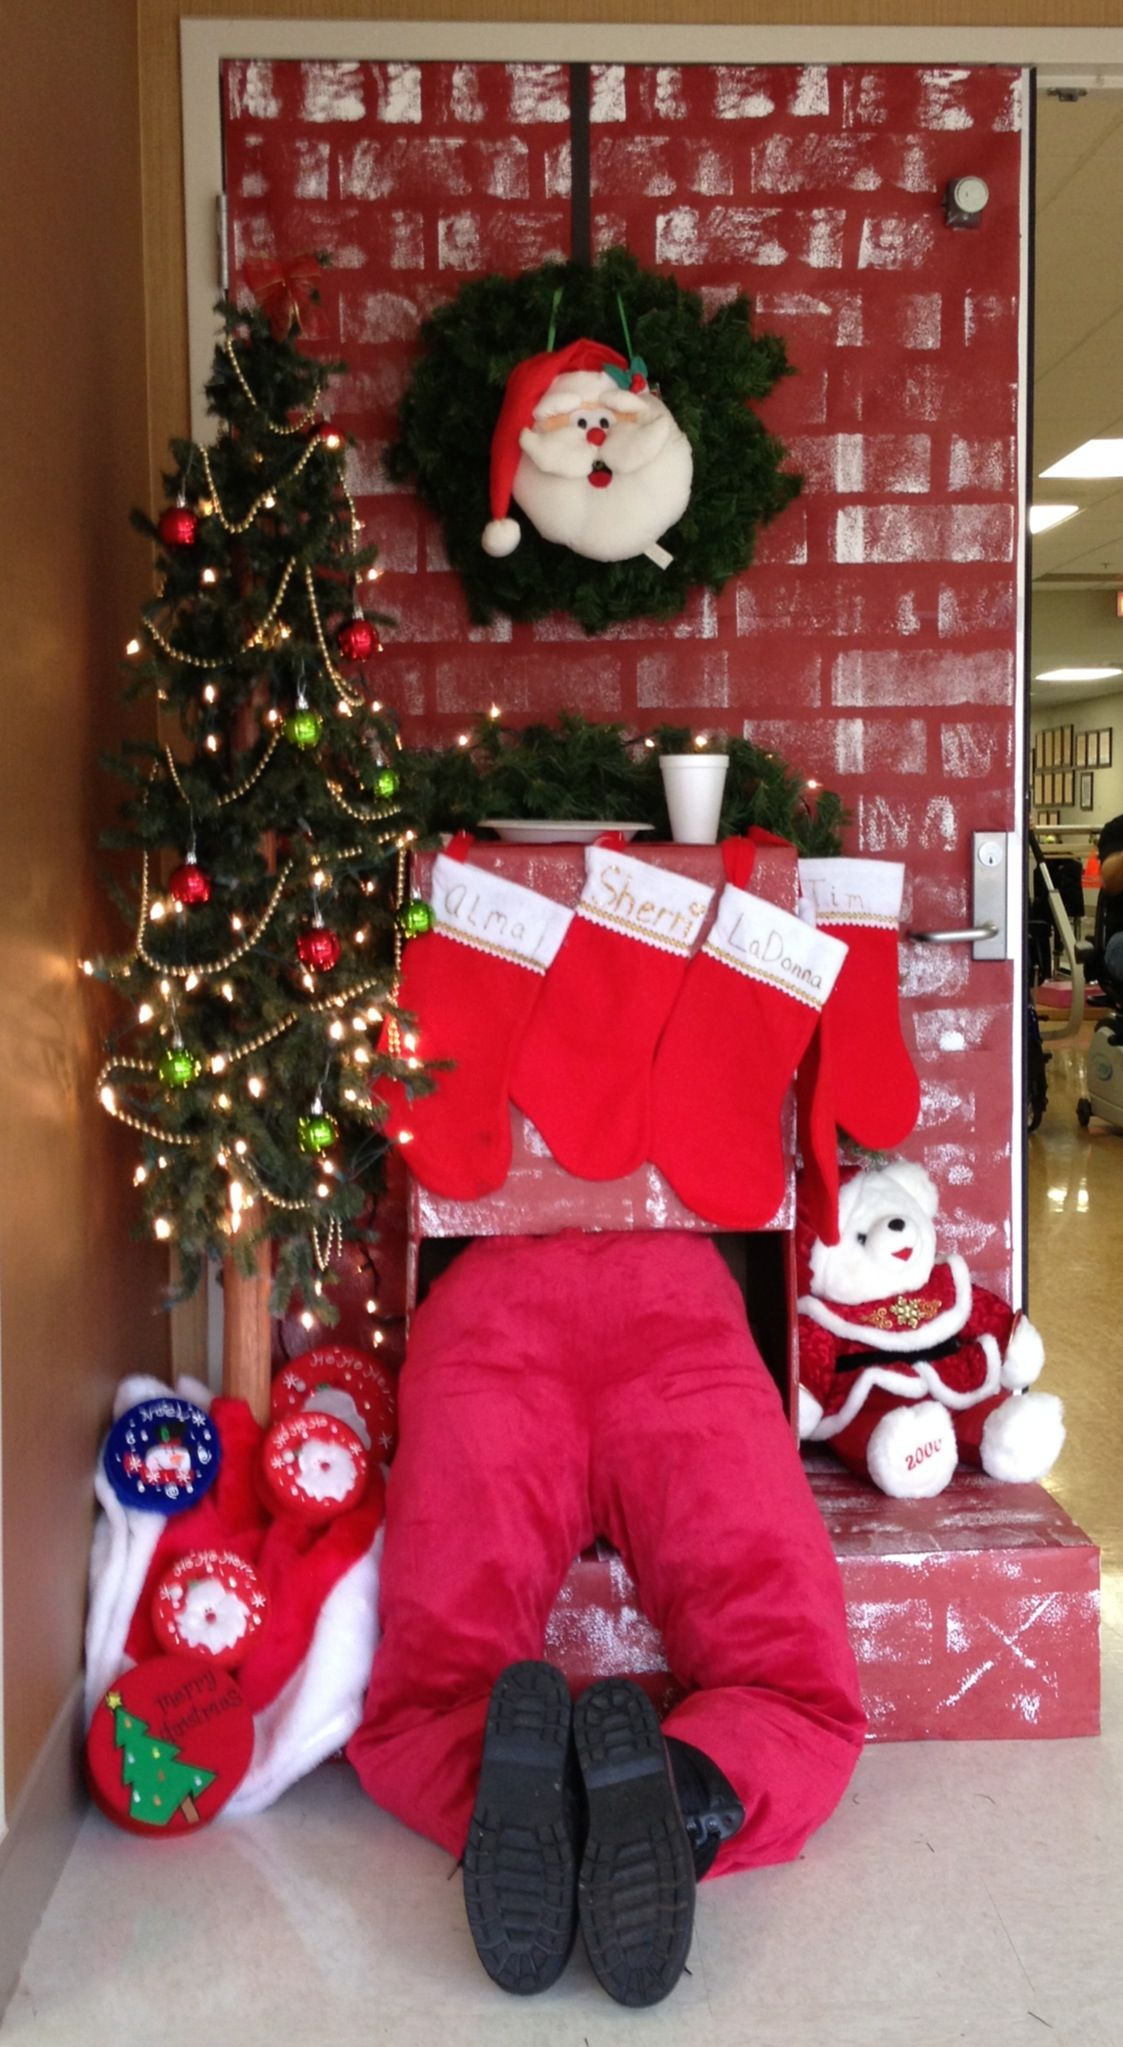 Santa in fireplace. Santa in chimney. Door decoration